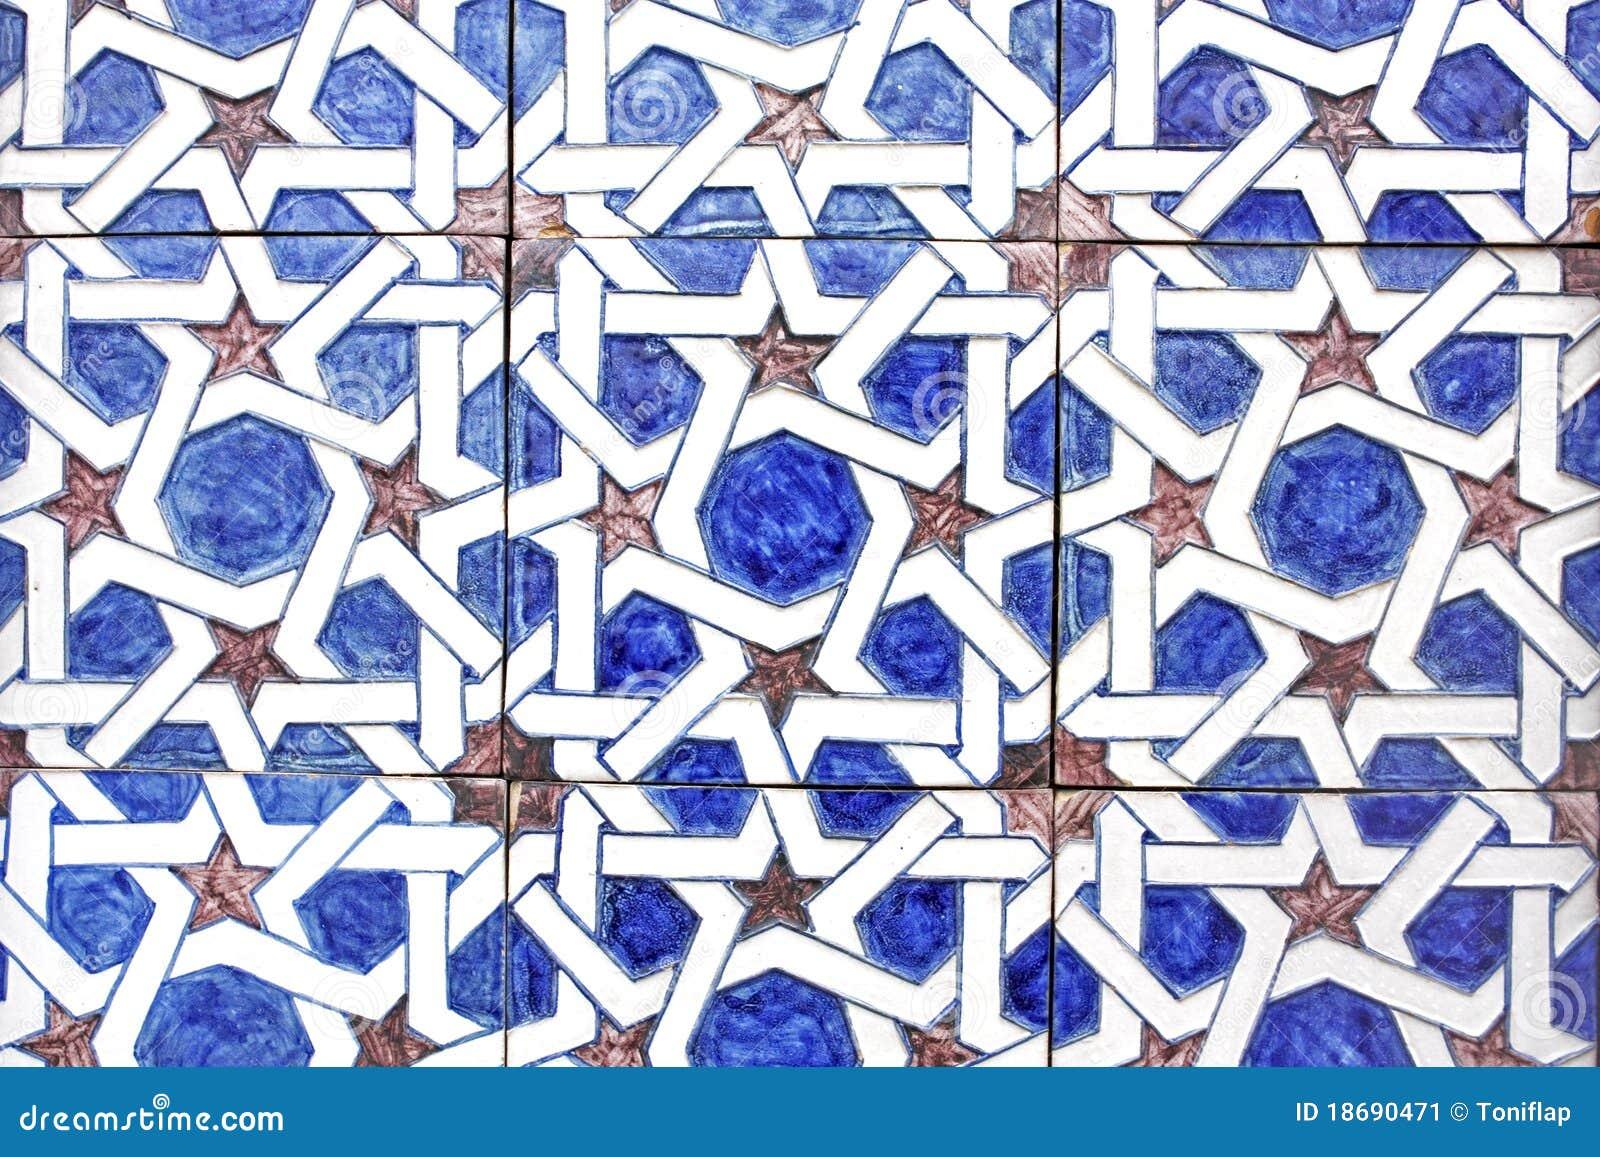 Azulejos rabes andaluc3ia espa a imagen de archivo - Azulejos clasicos ...